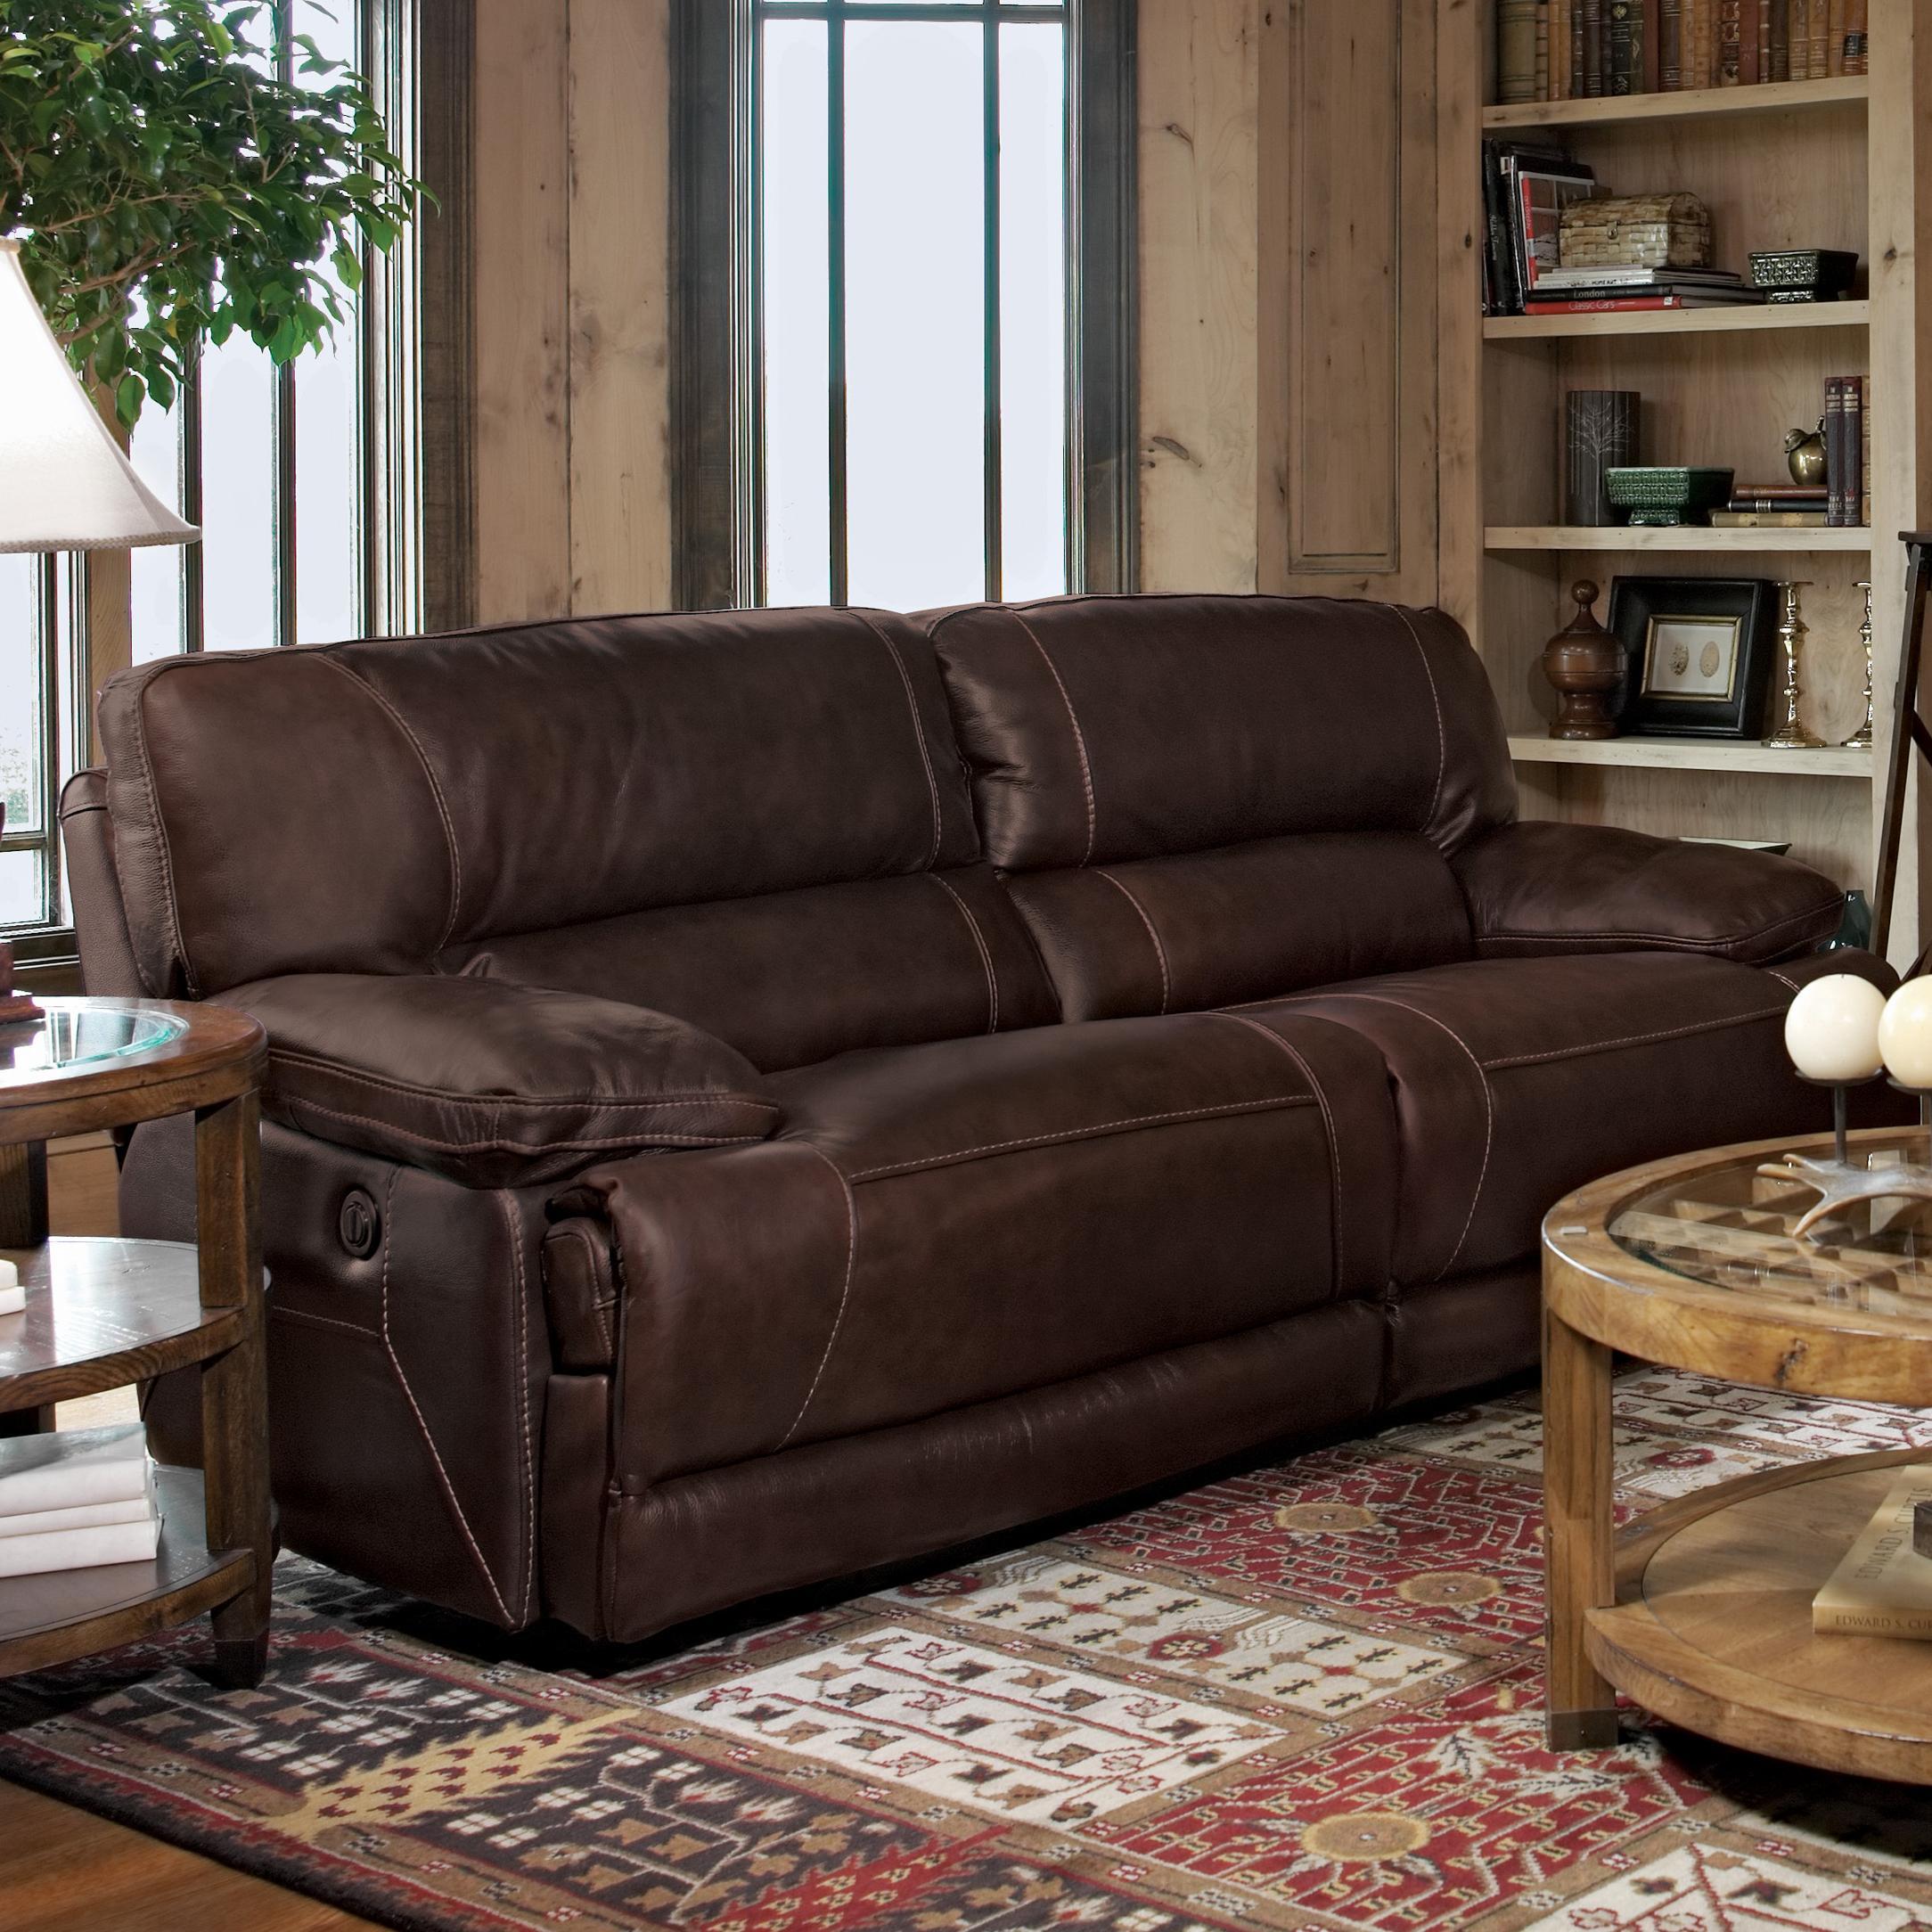 Flexsteel fleet street double power reclining sofa wayside furniture reclining sofas - Sofa reclinable ...